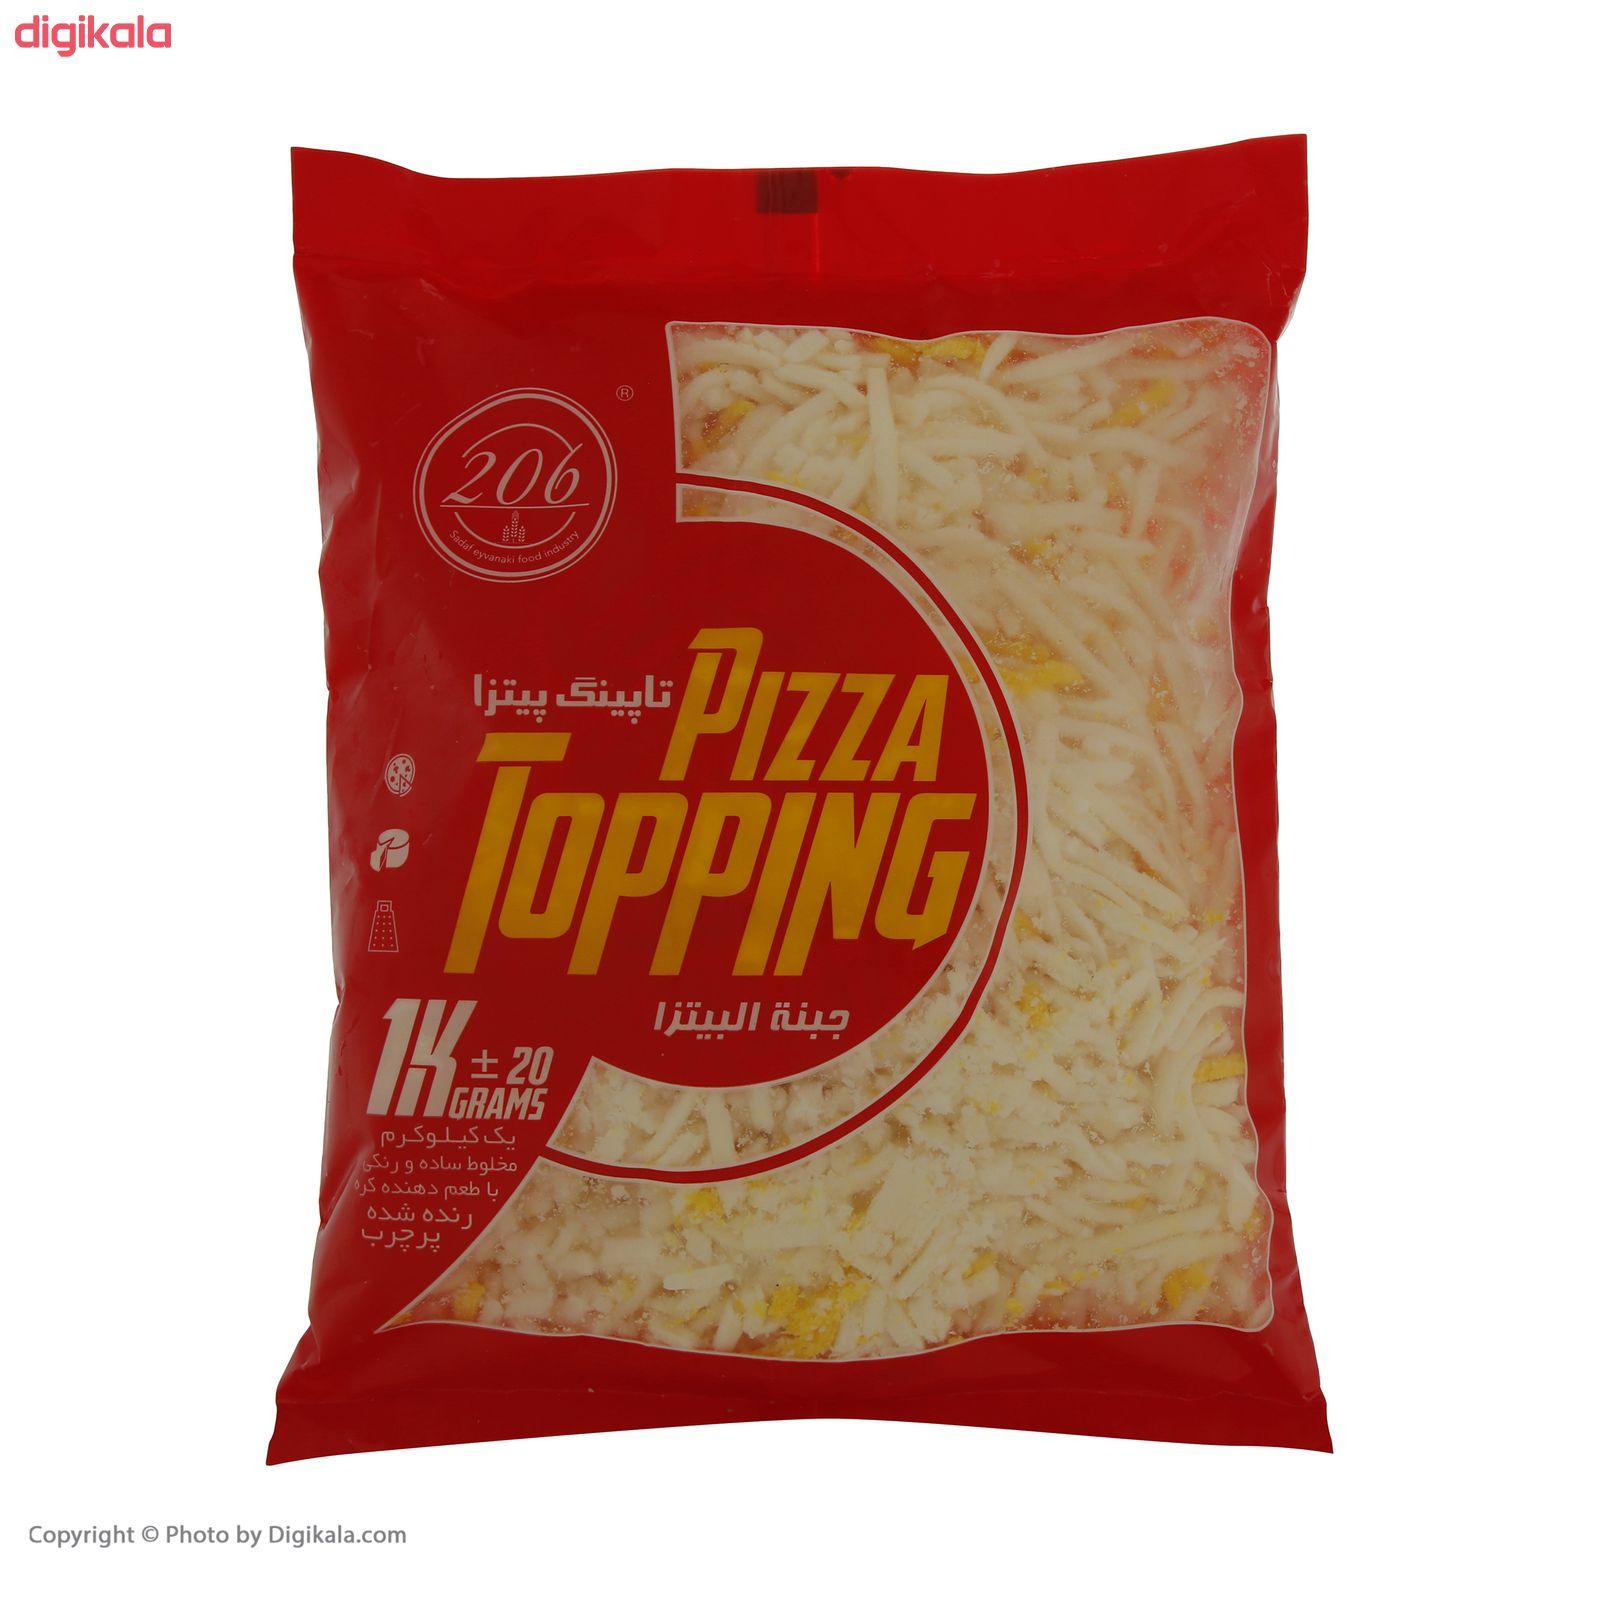 پنیر پیتزا رنده شده 206 - 1 کیلوگرم main 1 1